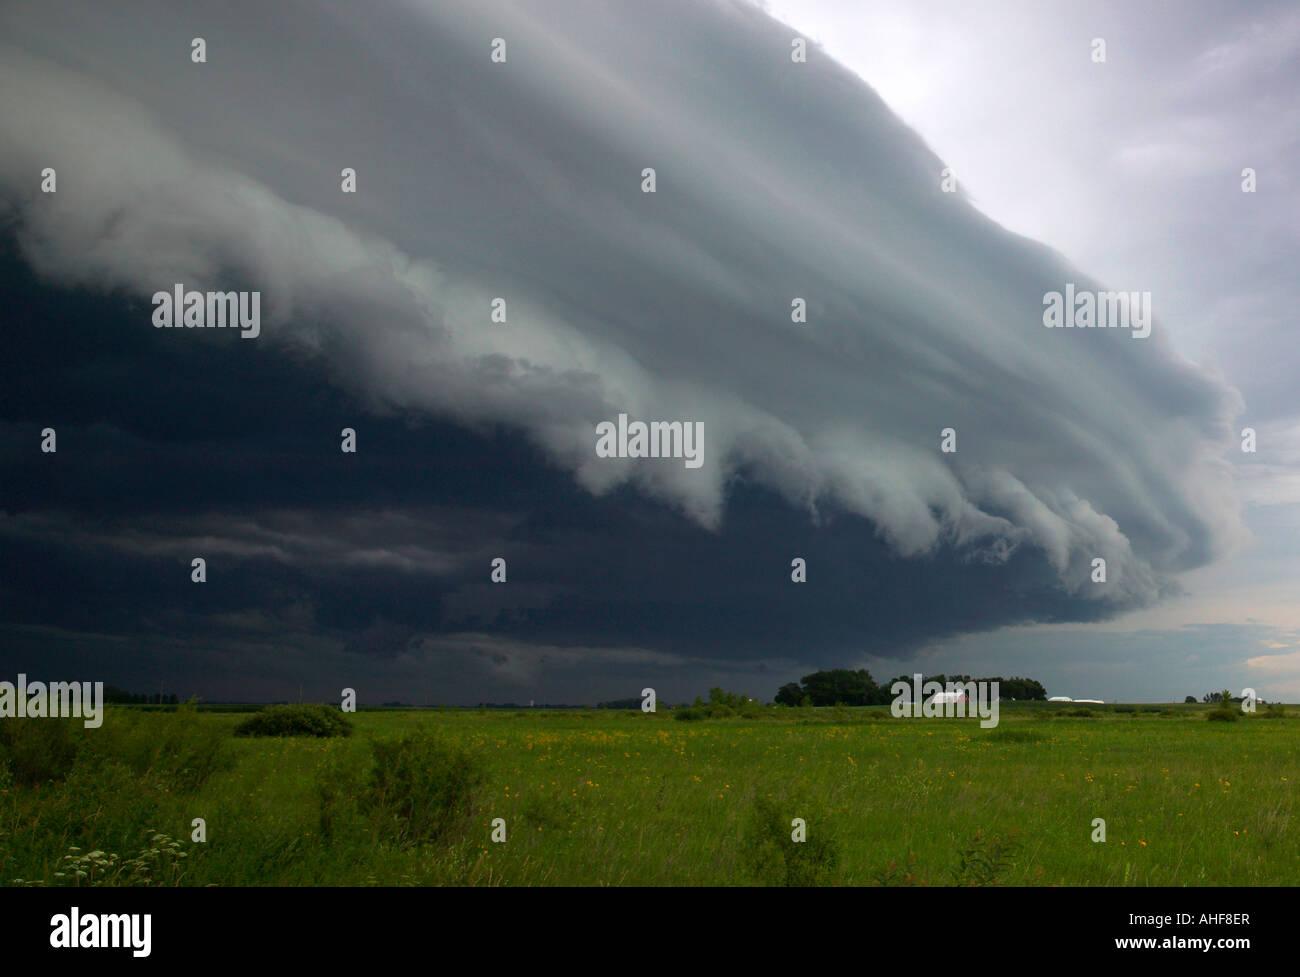 shelf cloud over prairie and farm, Minnesota USA - Stock Image